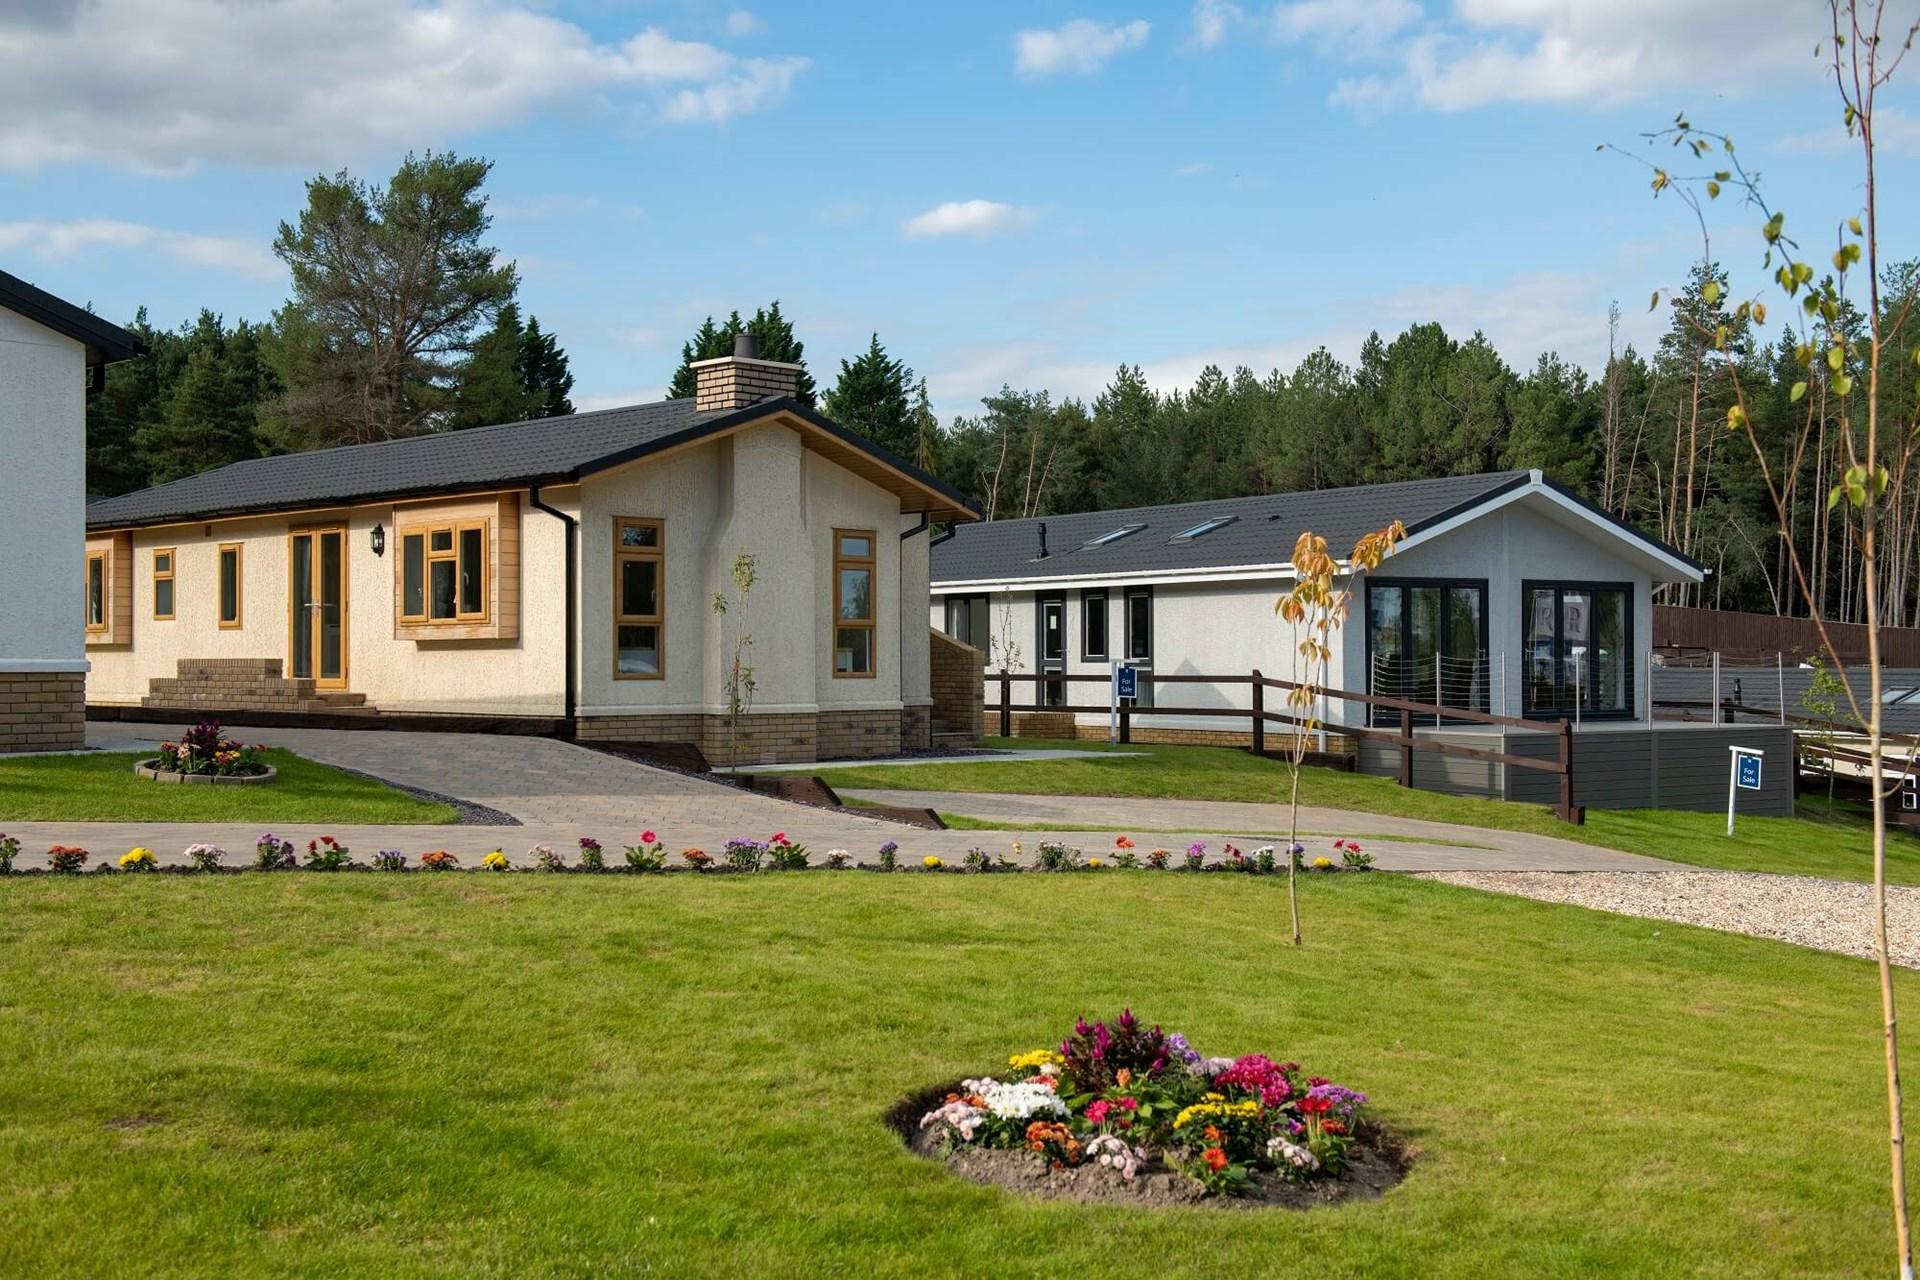 Royale life bungalows